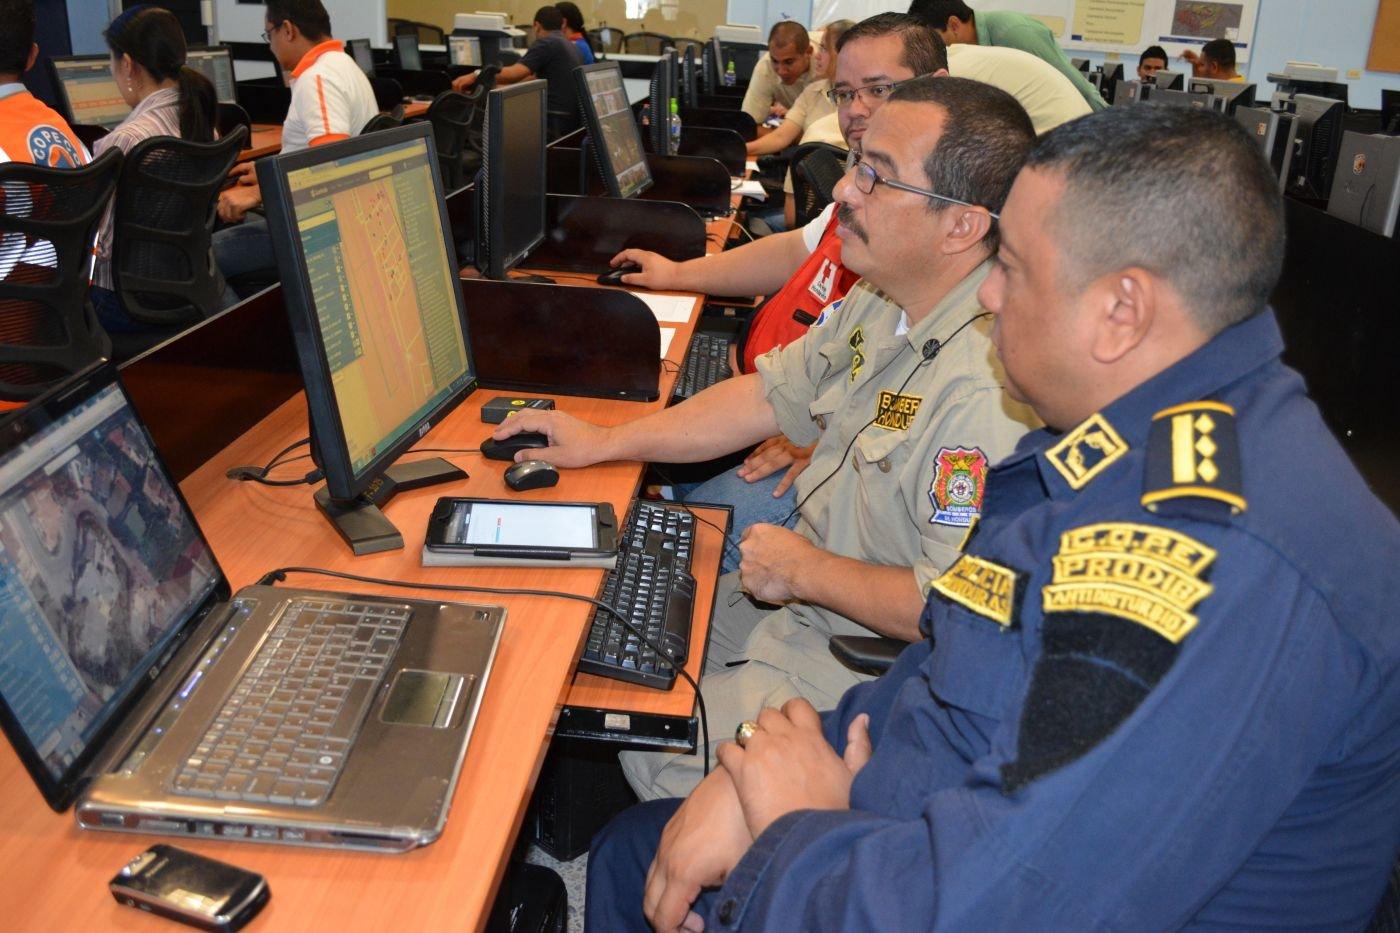 Testing new technologies for disaster response